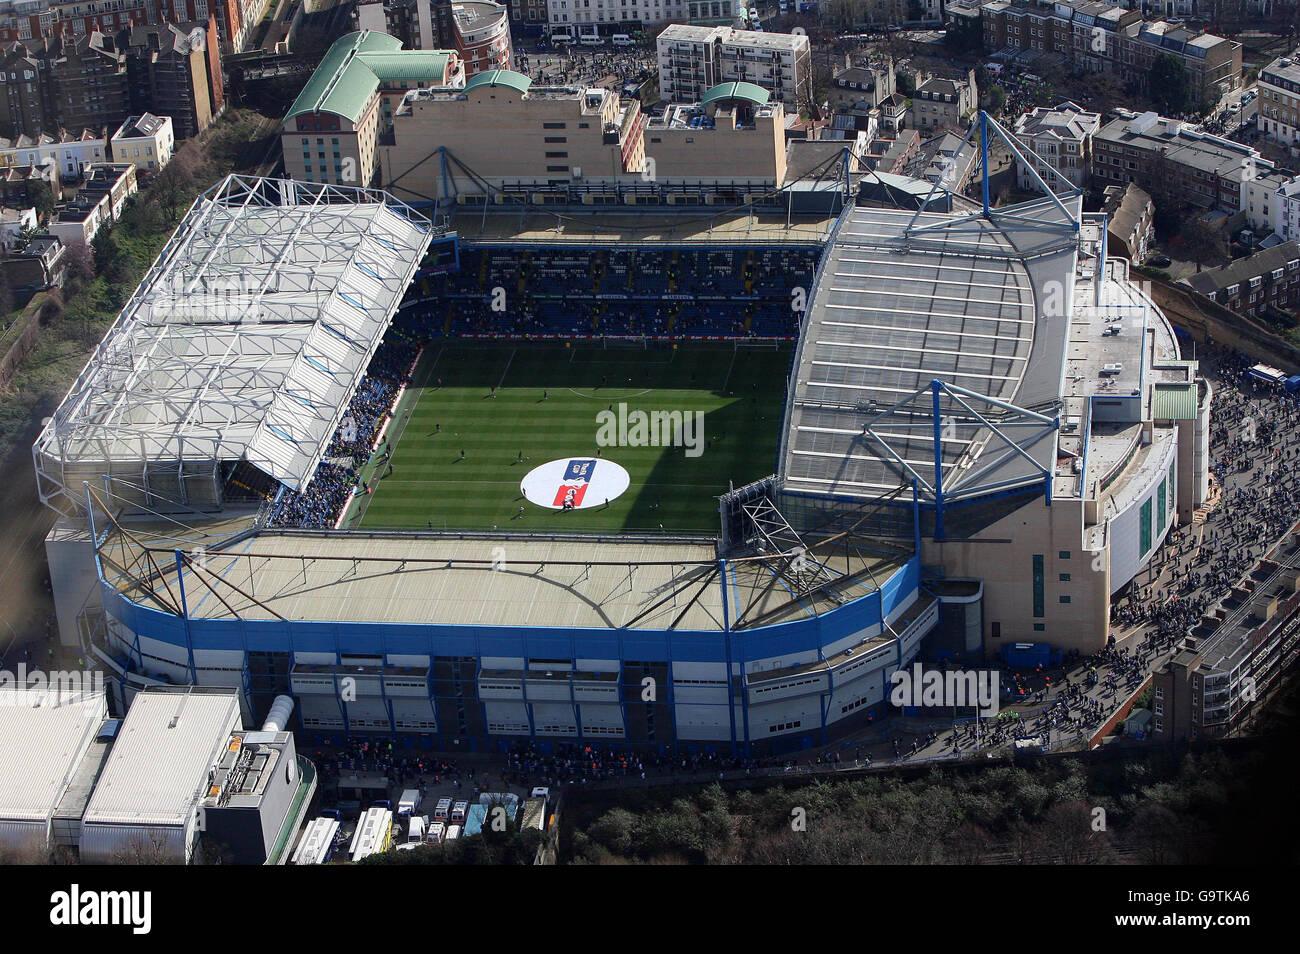 Soccer - Premiere League - Stadia - Chelsea - Stamford Bridge - London - Stock Image